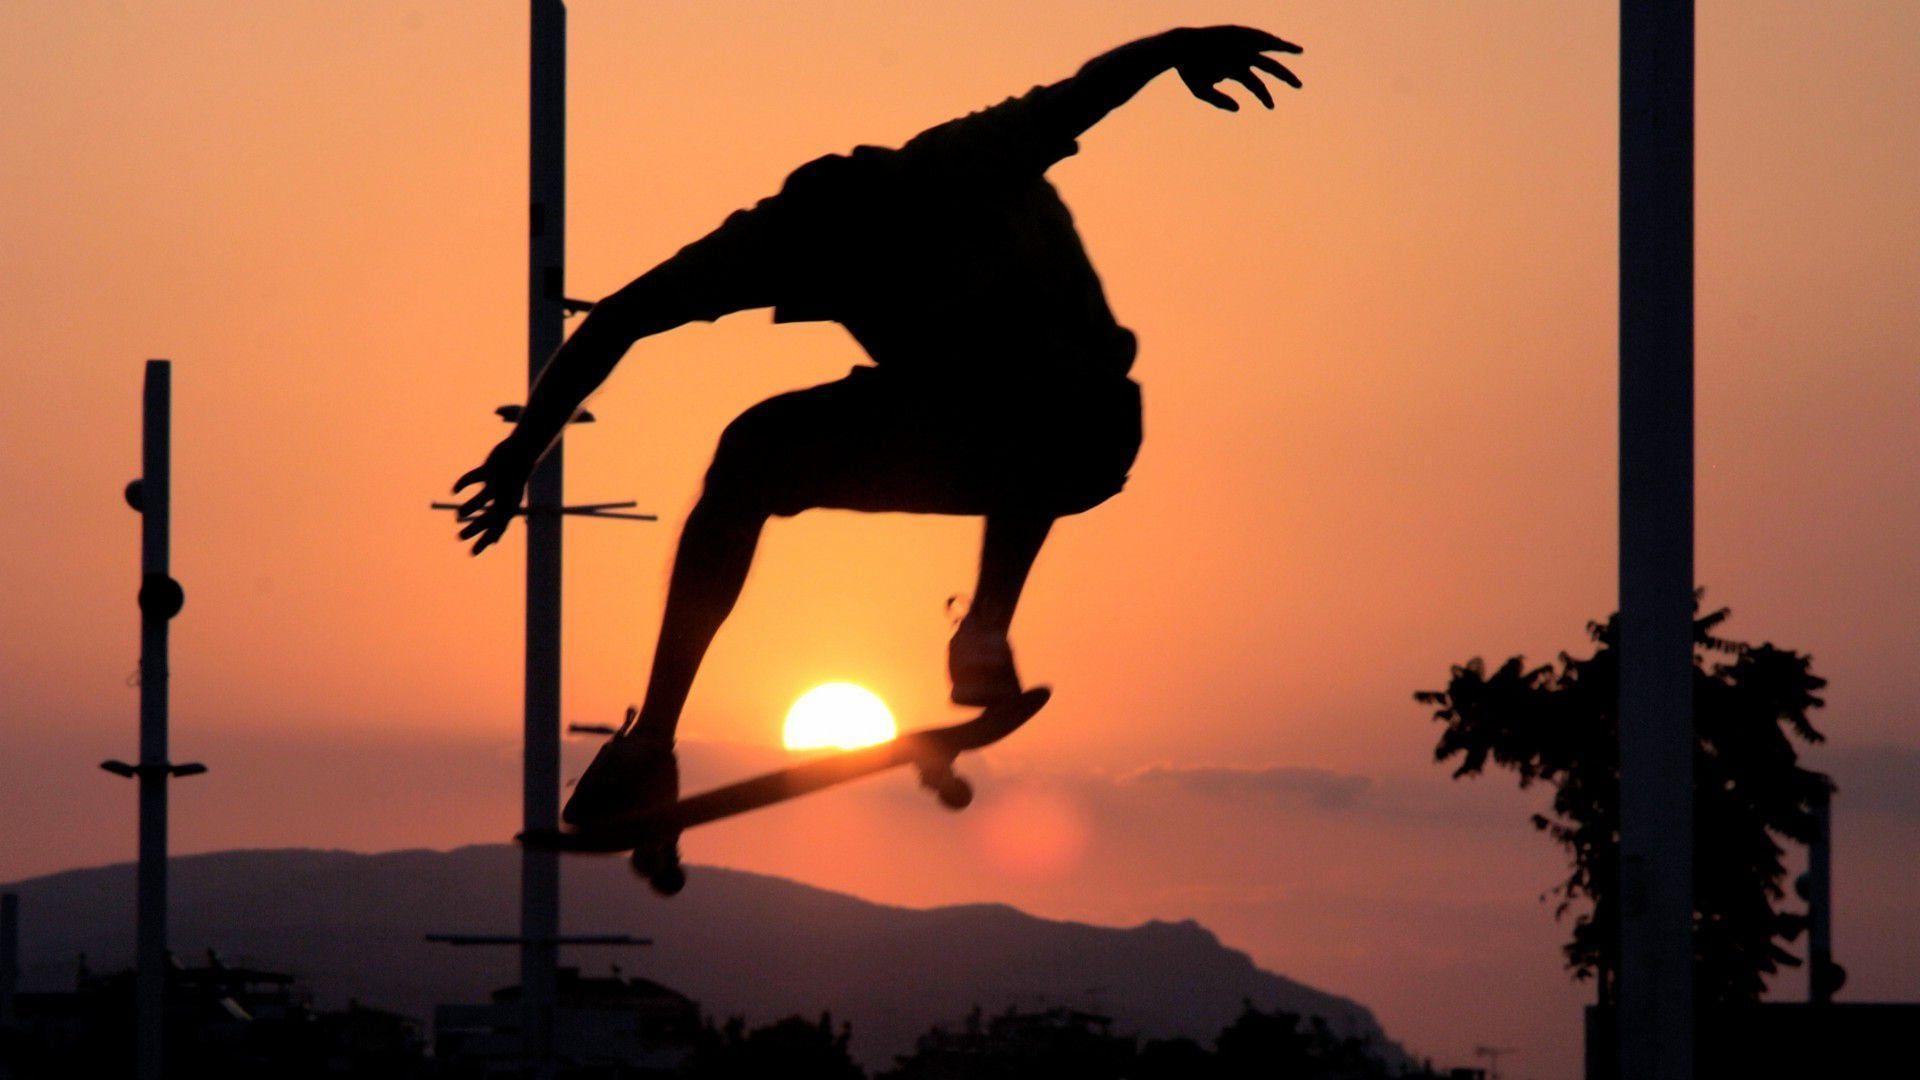 Skateboard Wallpapers Wallpaper 1600×1050 Skateboarding